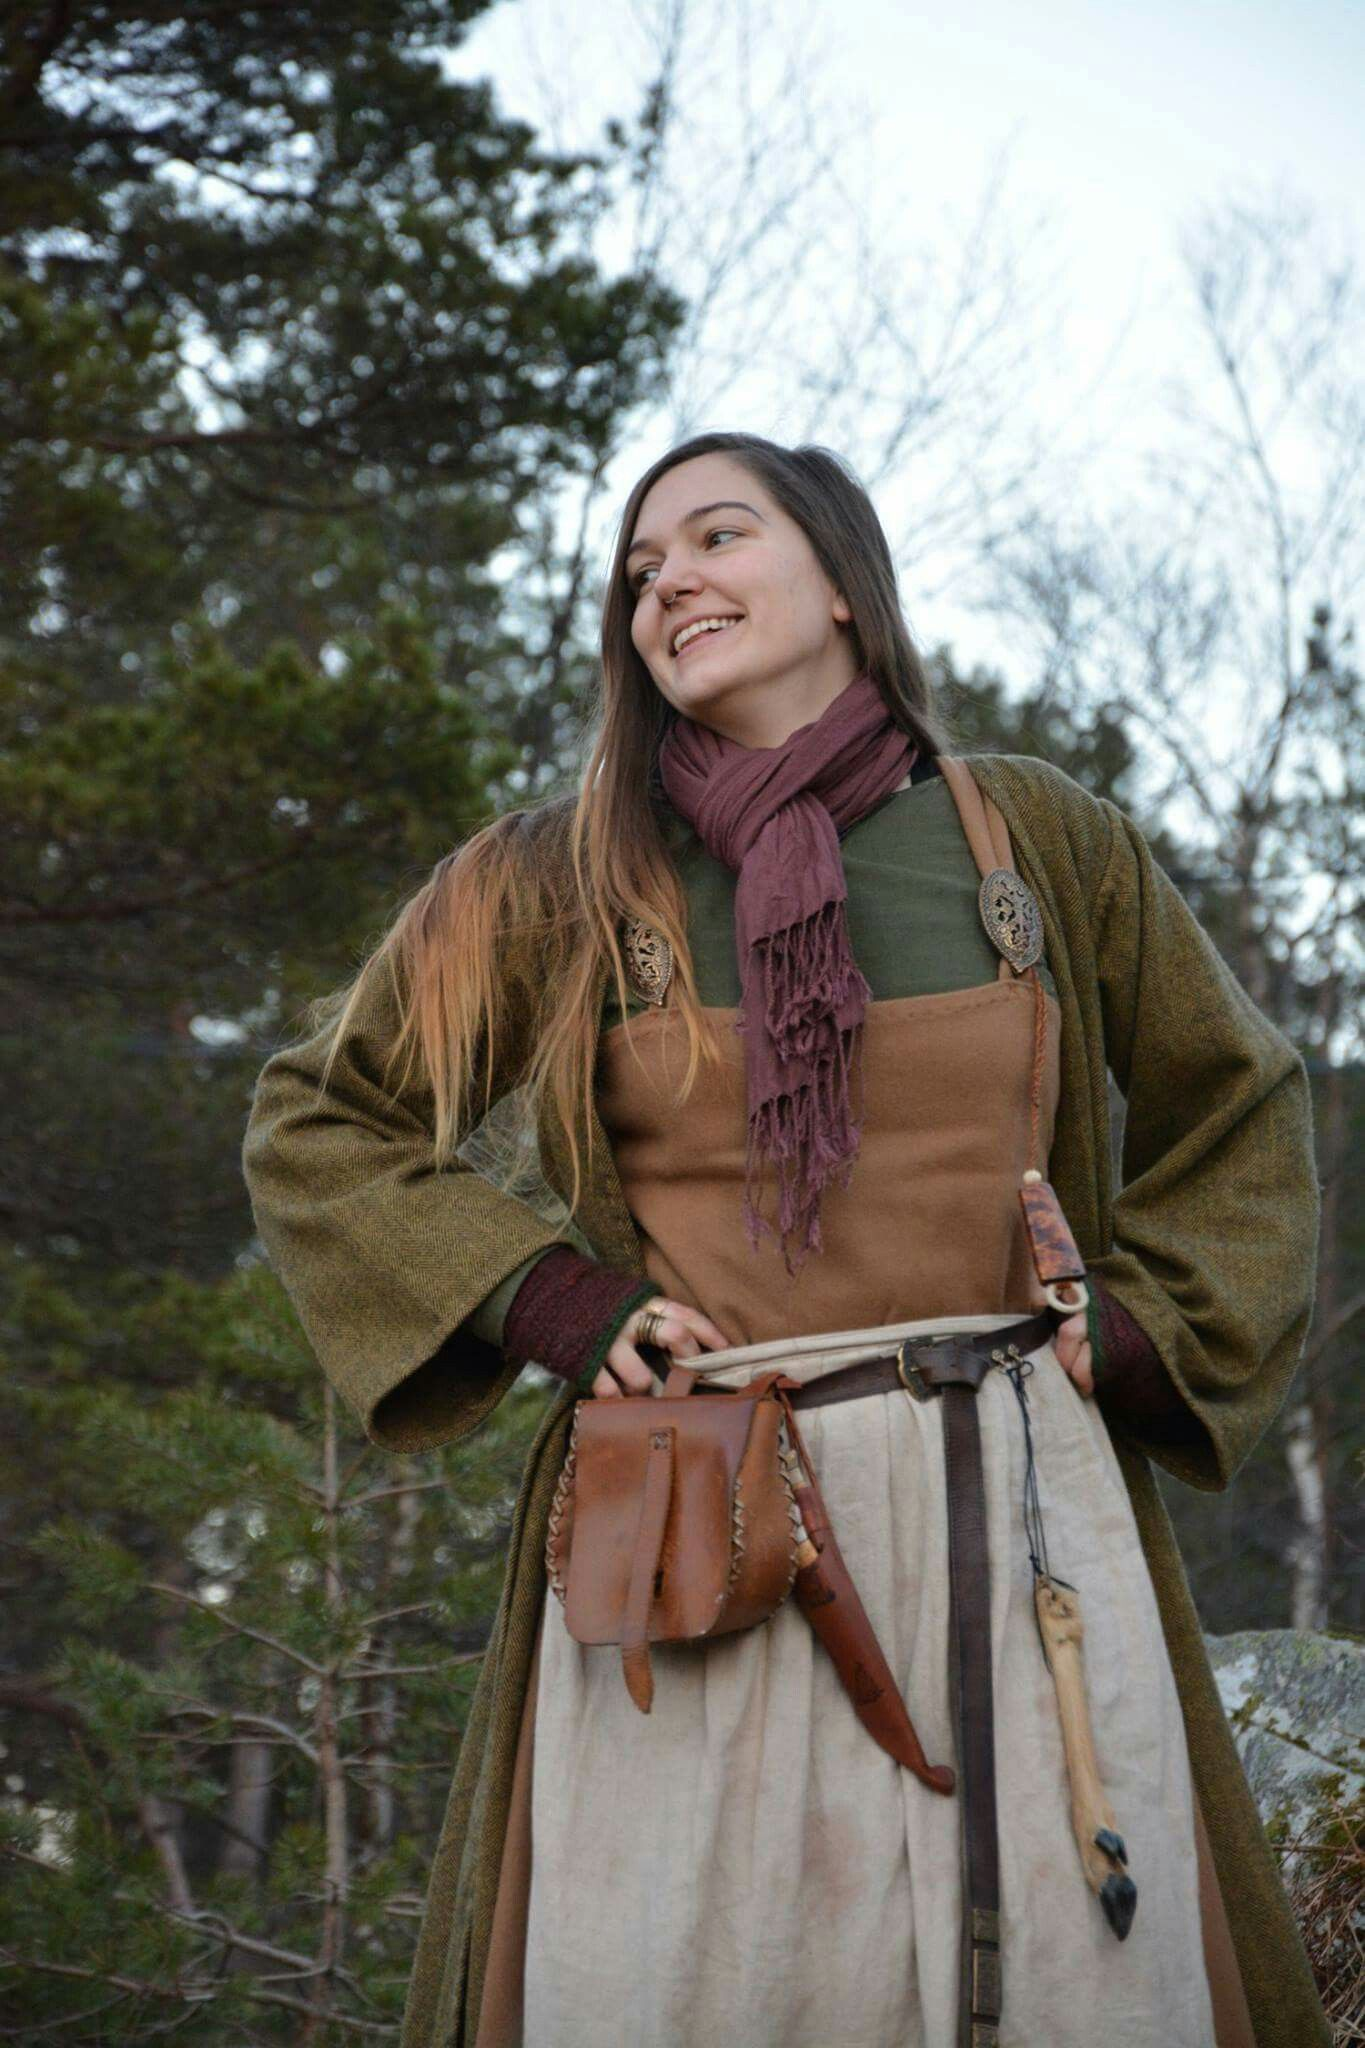 Female Viking Reenactor Norway Stevgaularane Norwegian Folk Music Photo By Liv Heidi Ekre Viking Garb Viking Clothing Norse Clothing